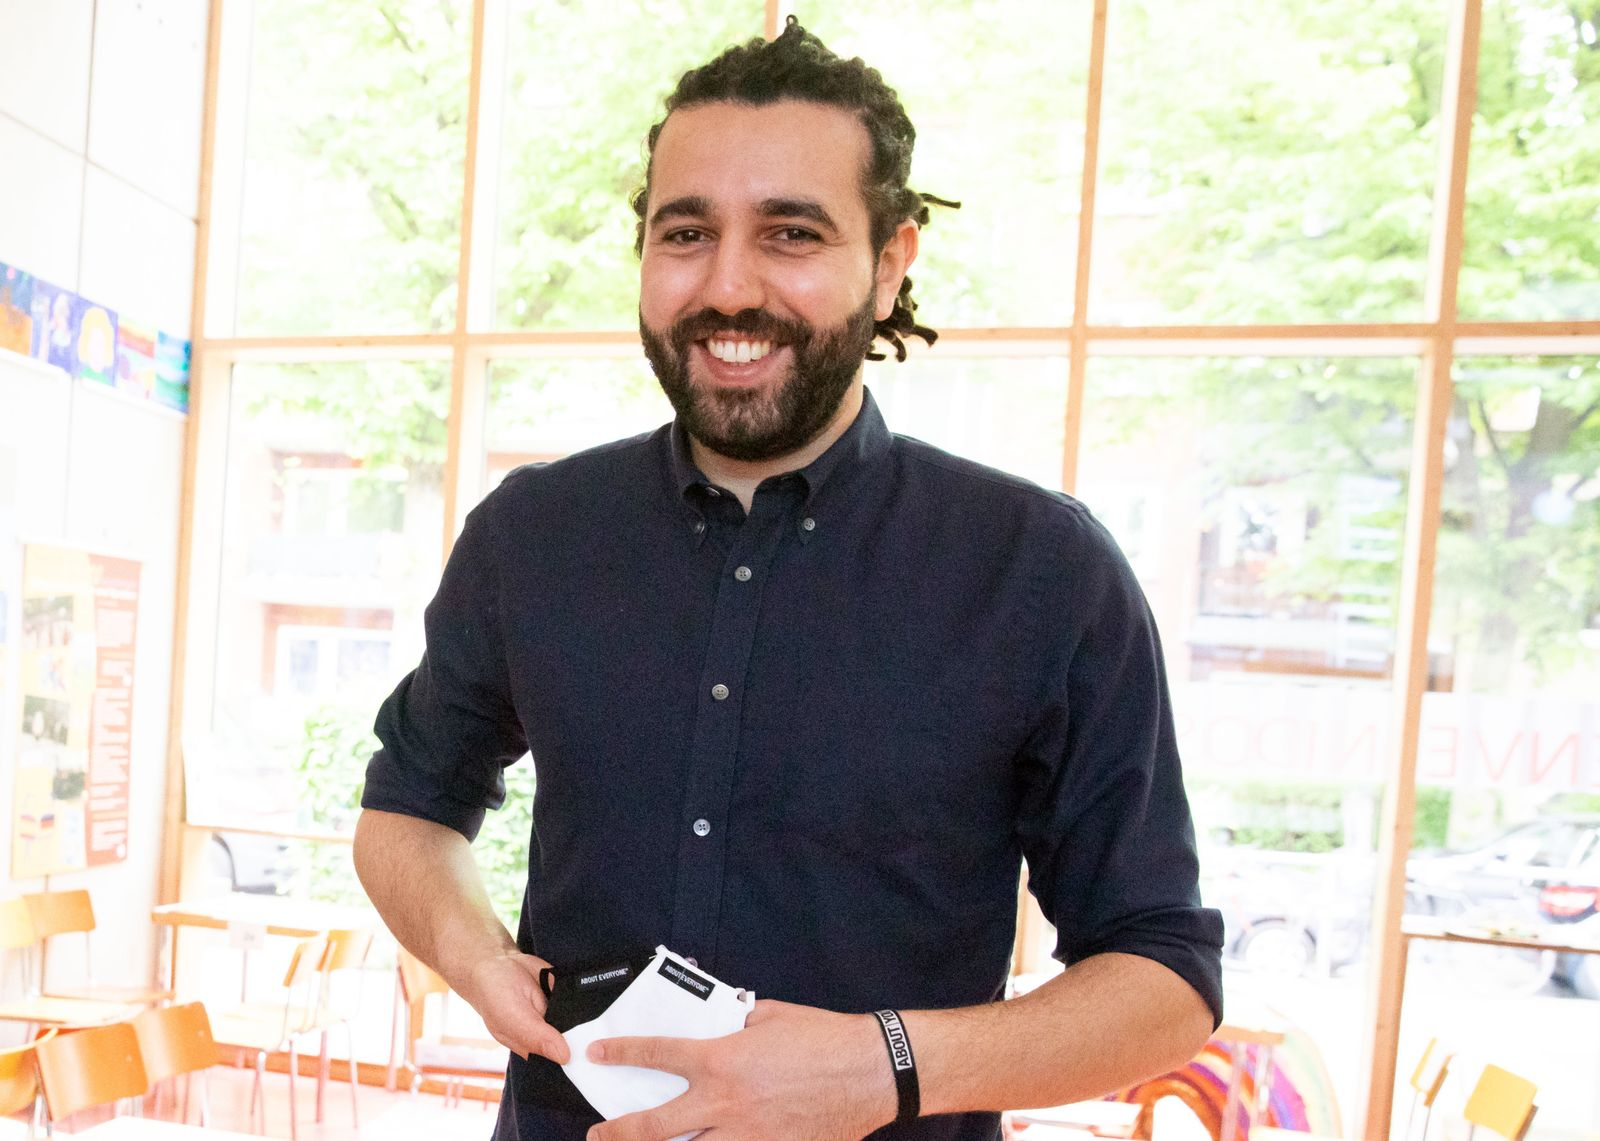 Hamburgs Schulsenator Rabe stellt Corona-Hygienemaßnahmen vor